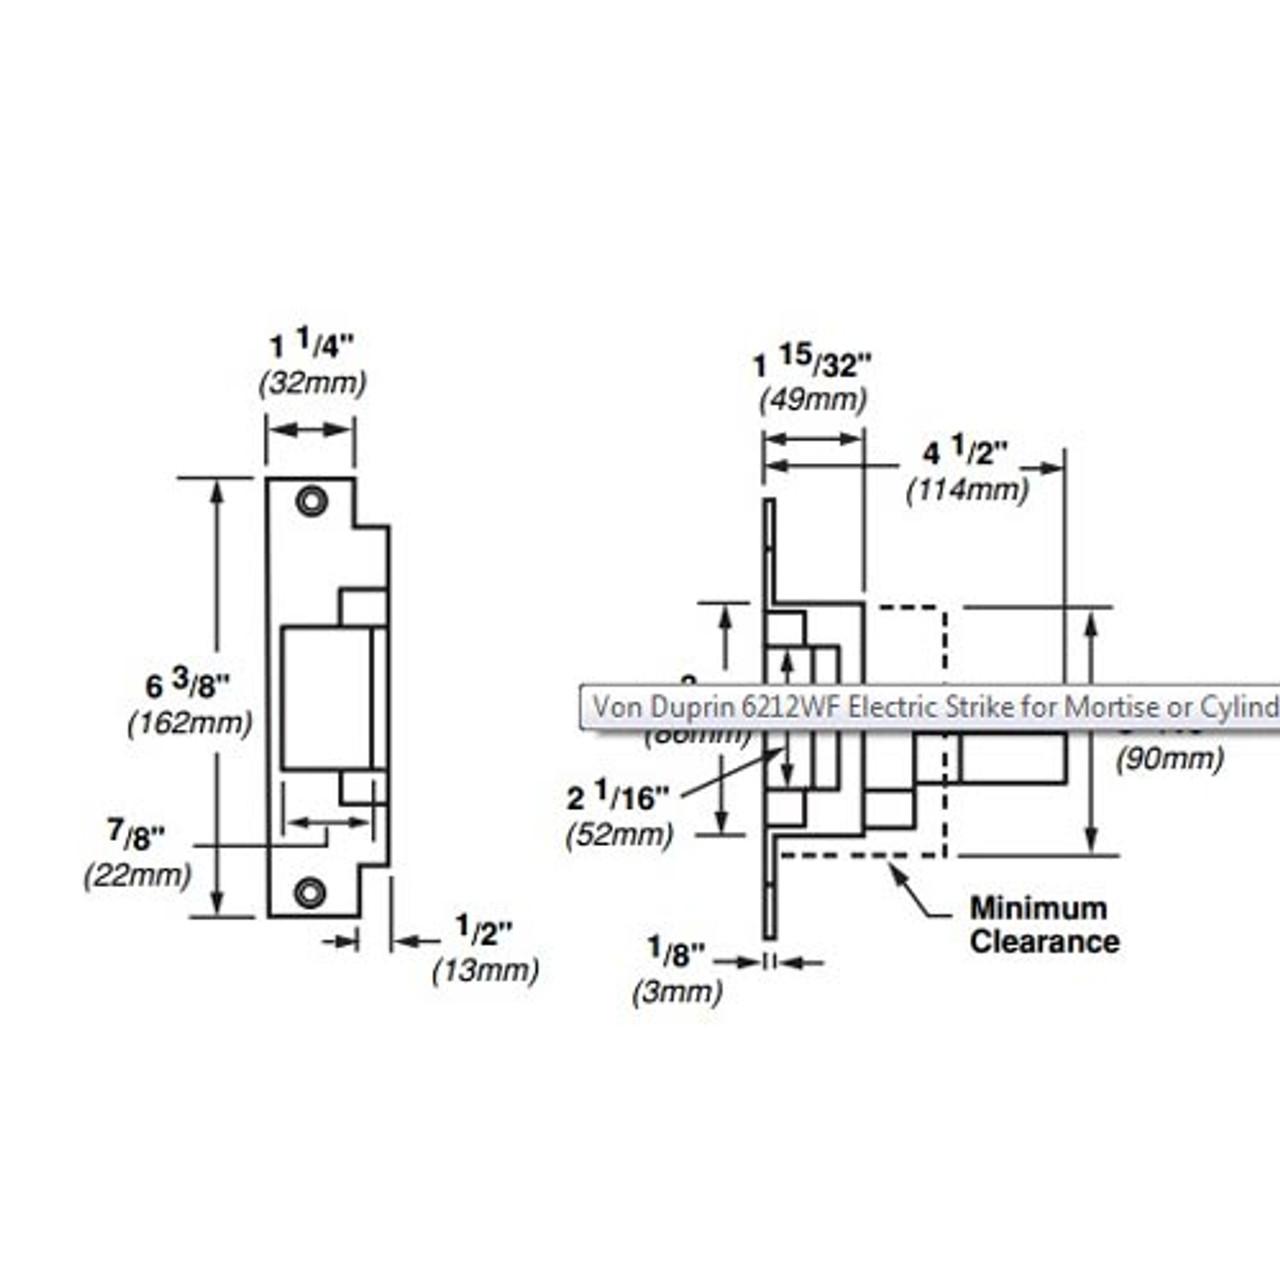 6212WF-24VDC-US10 Von Duprin Electric Strike for Mortise or Cylindrical Locksets in Satin Bronze Finish